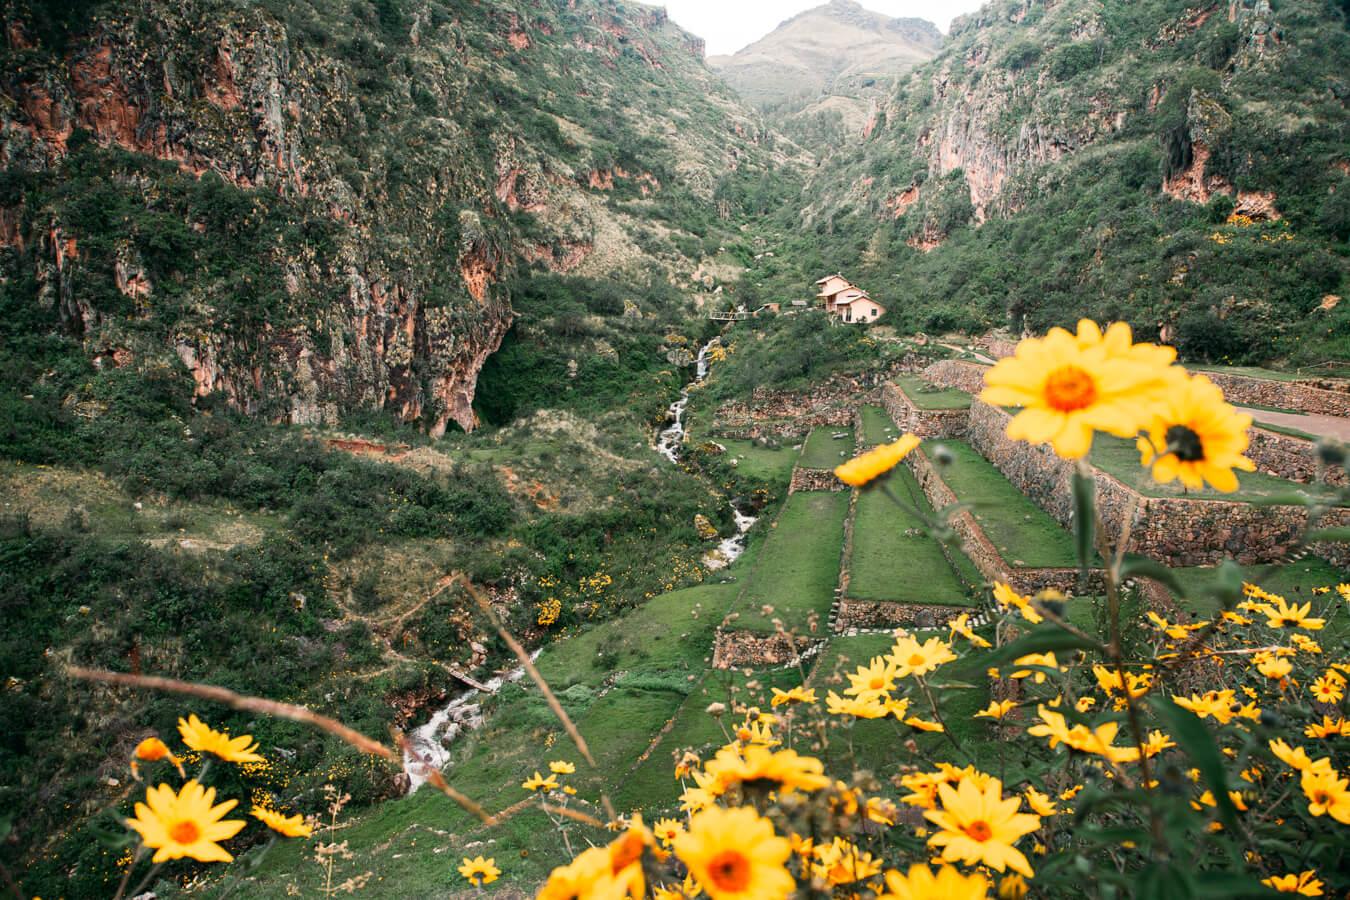 Ruínas de Pisaq | Boleto turístico de Cusco